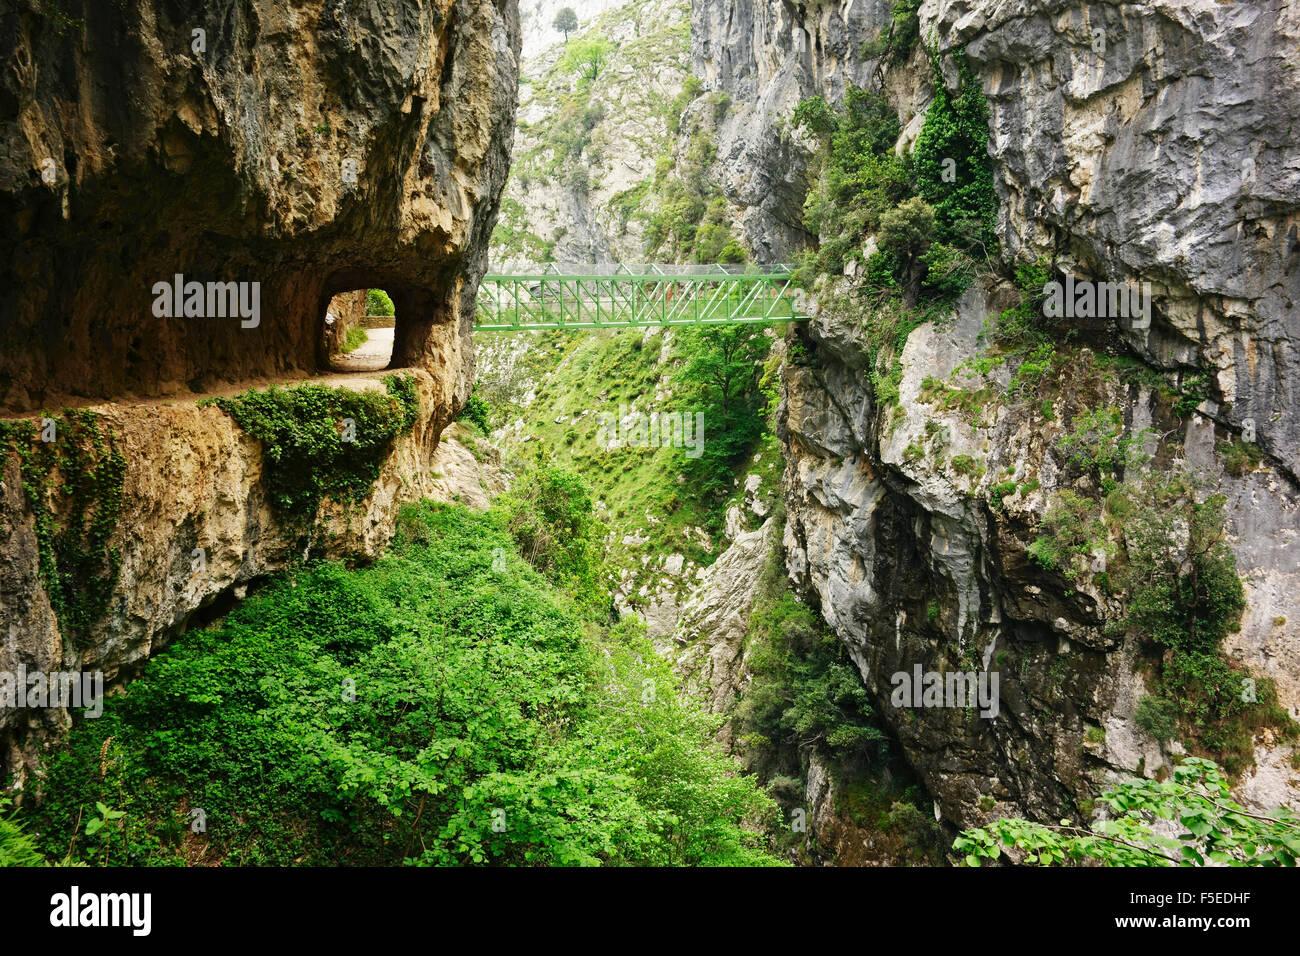 Footpath through Desfiladero del Rio Cares, Picos de Europa, Parque Nacional de los Picos de Europa, Asturias, Cantabria, - Stock Image